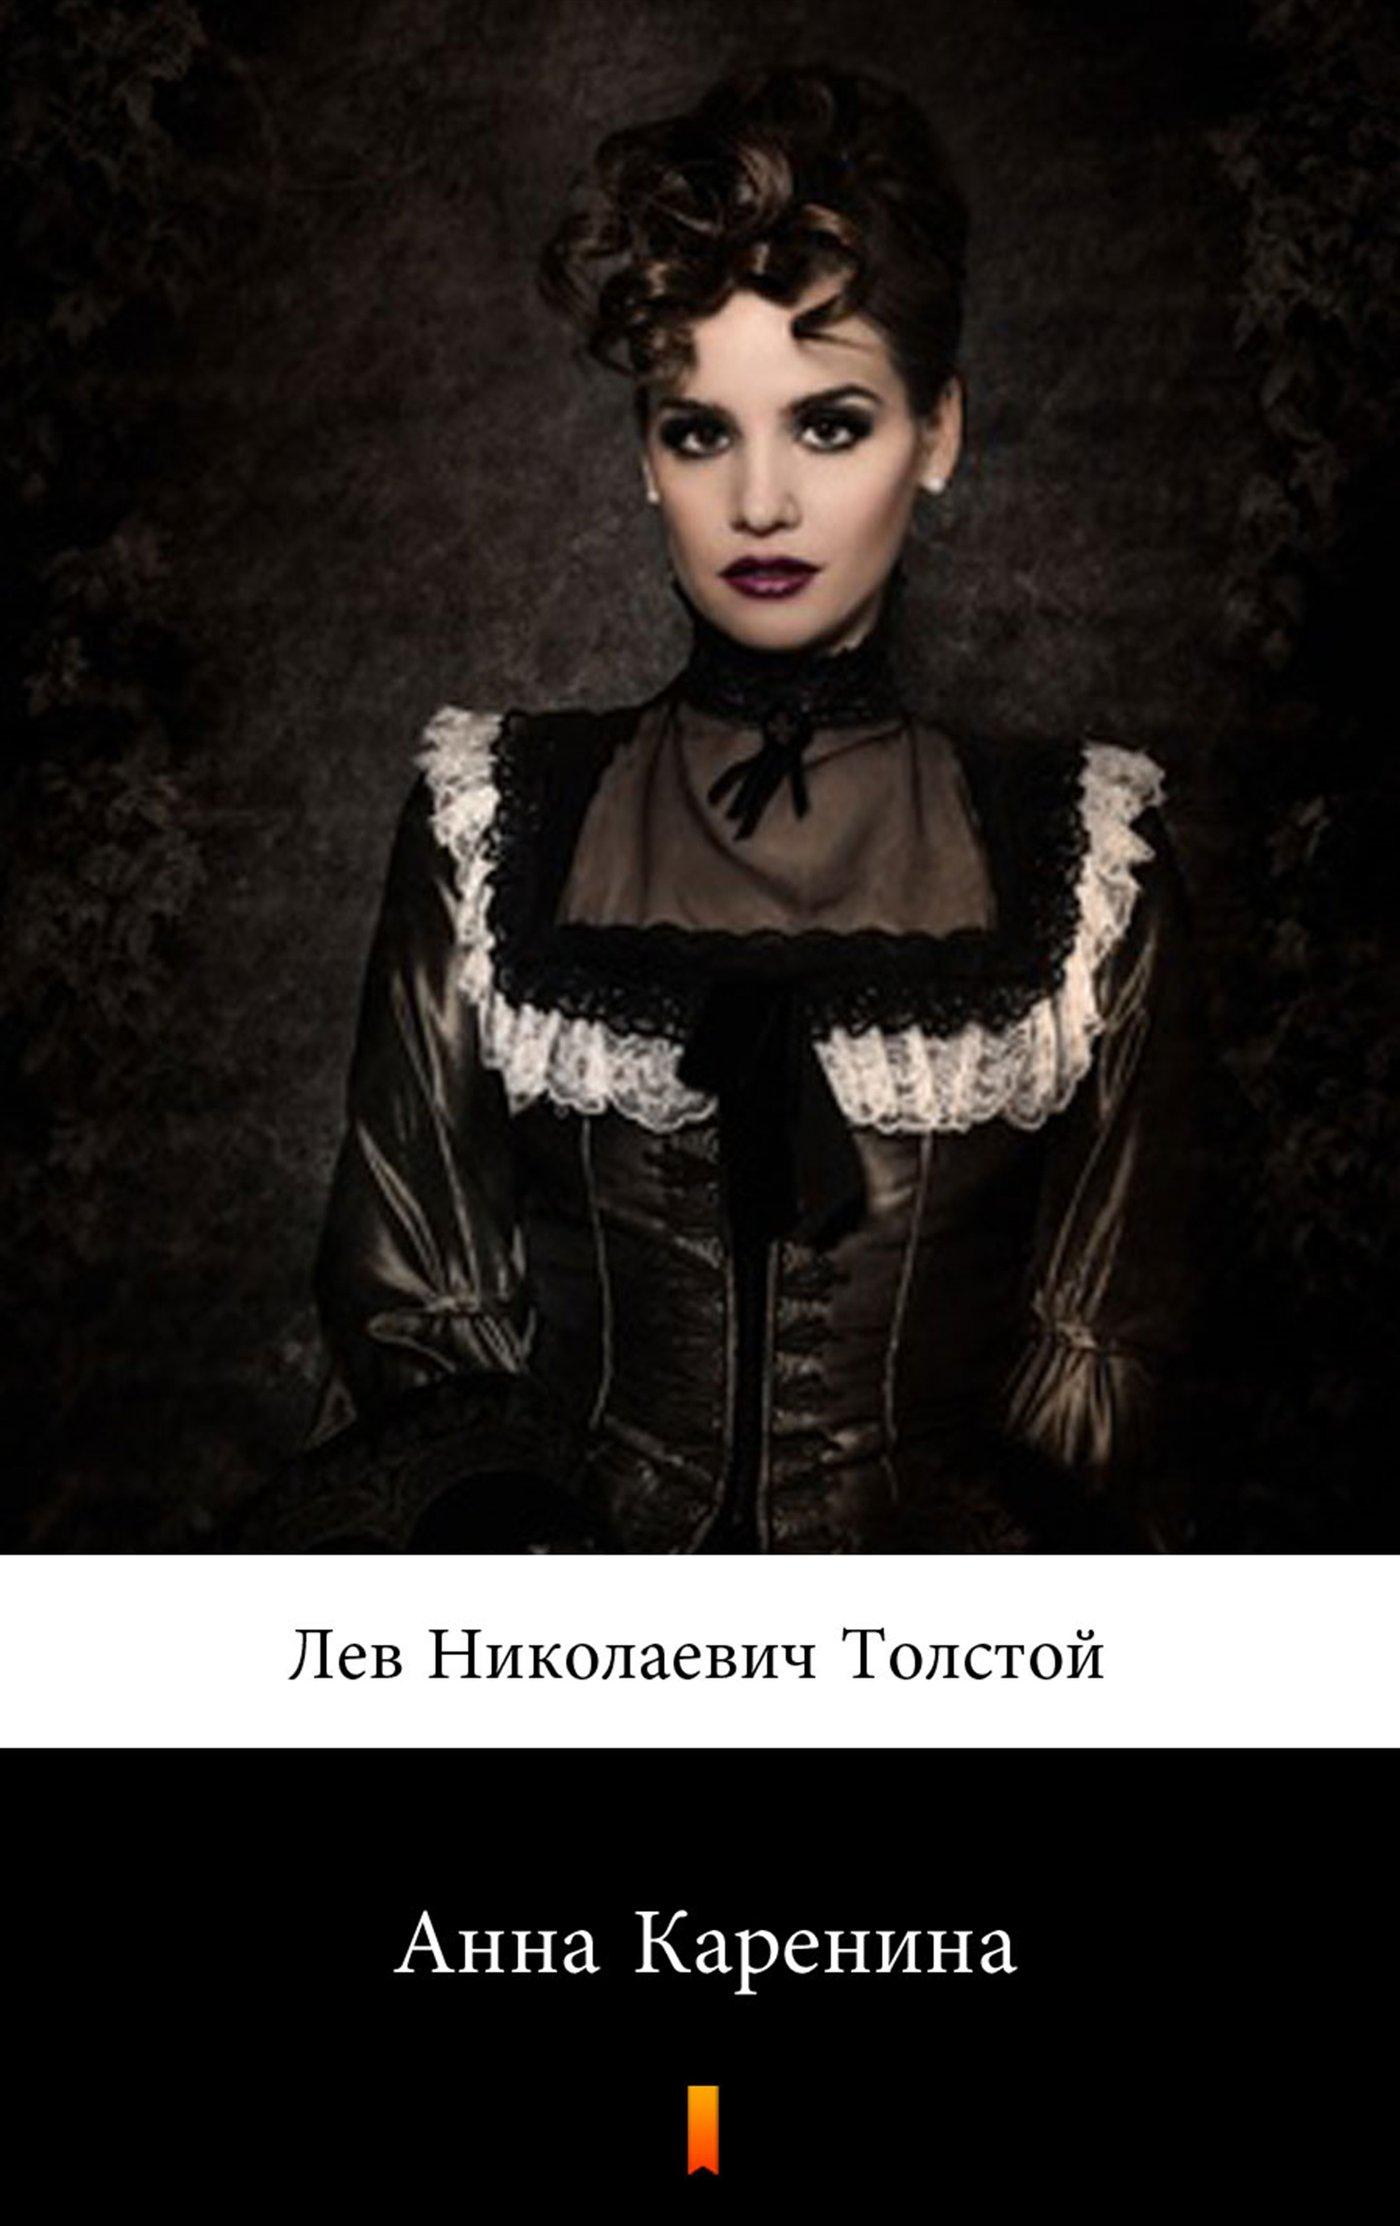 Анна Каренина - Ebook (Książka na Kindle) do pobrania w formacie MOBI